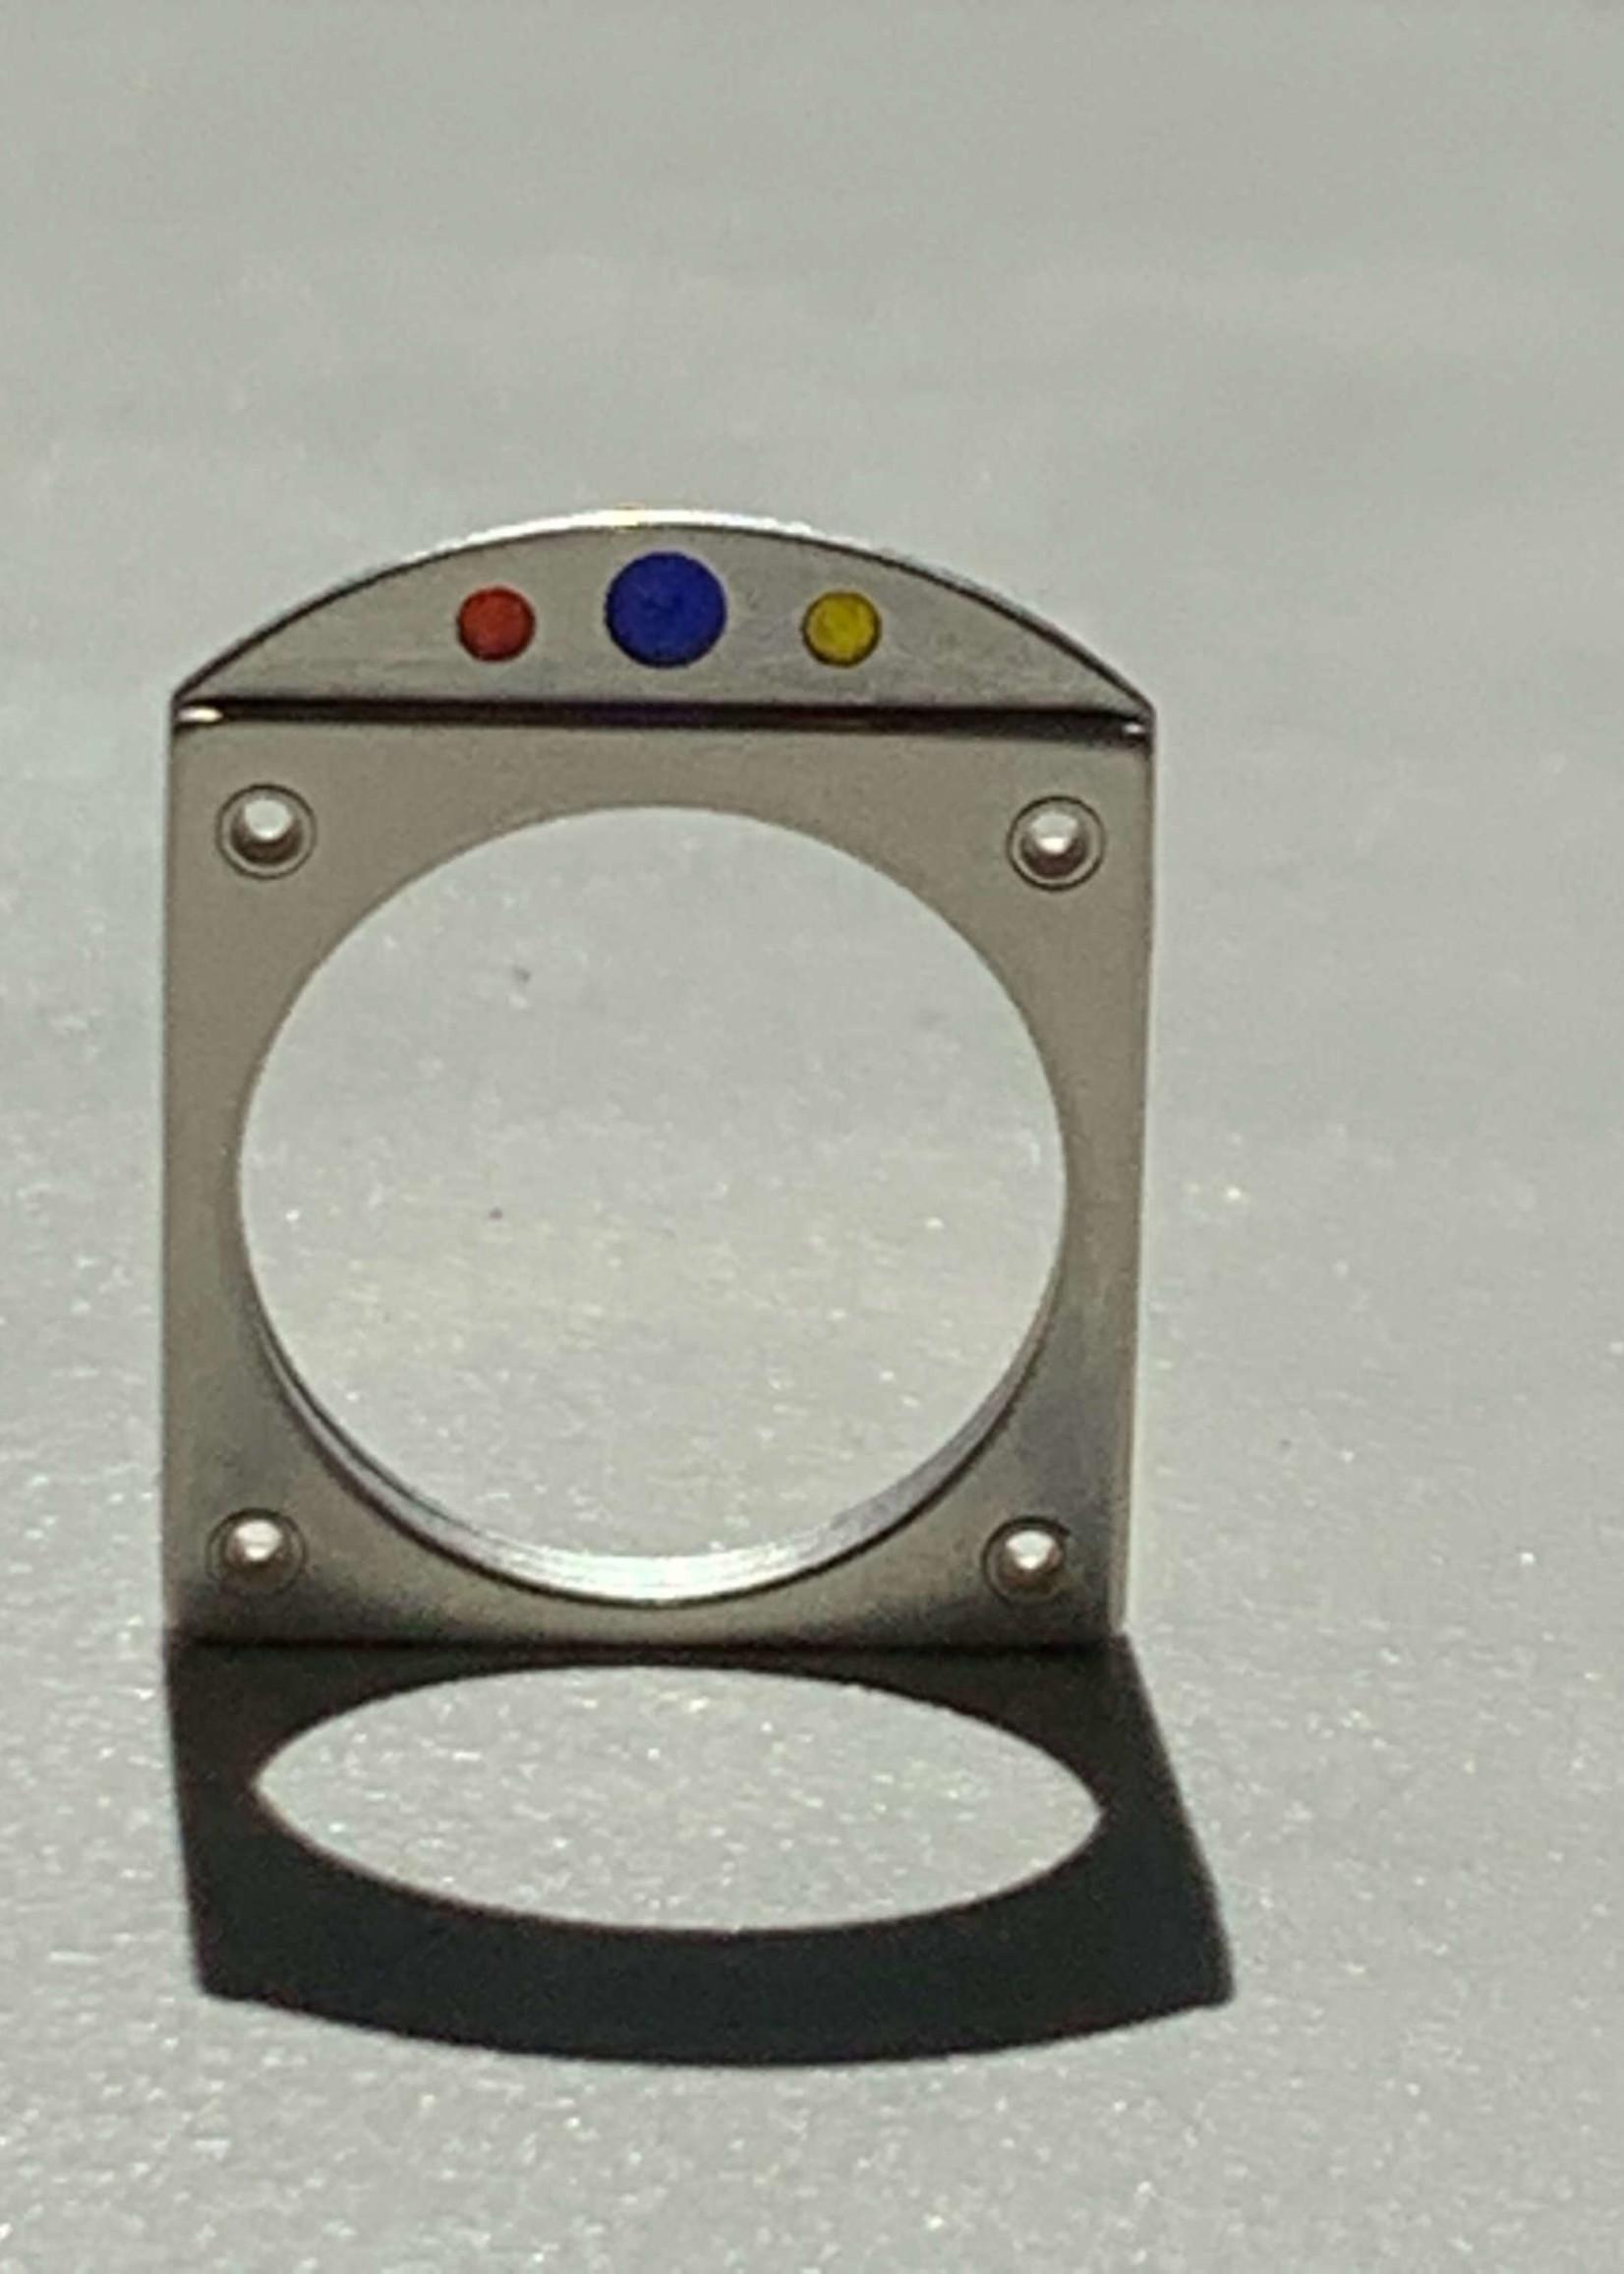 Hilary Finck Jewelry Hilary Finck Dome Rivet Ring